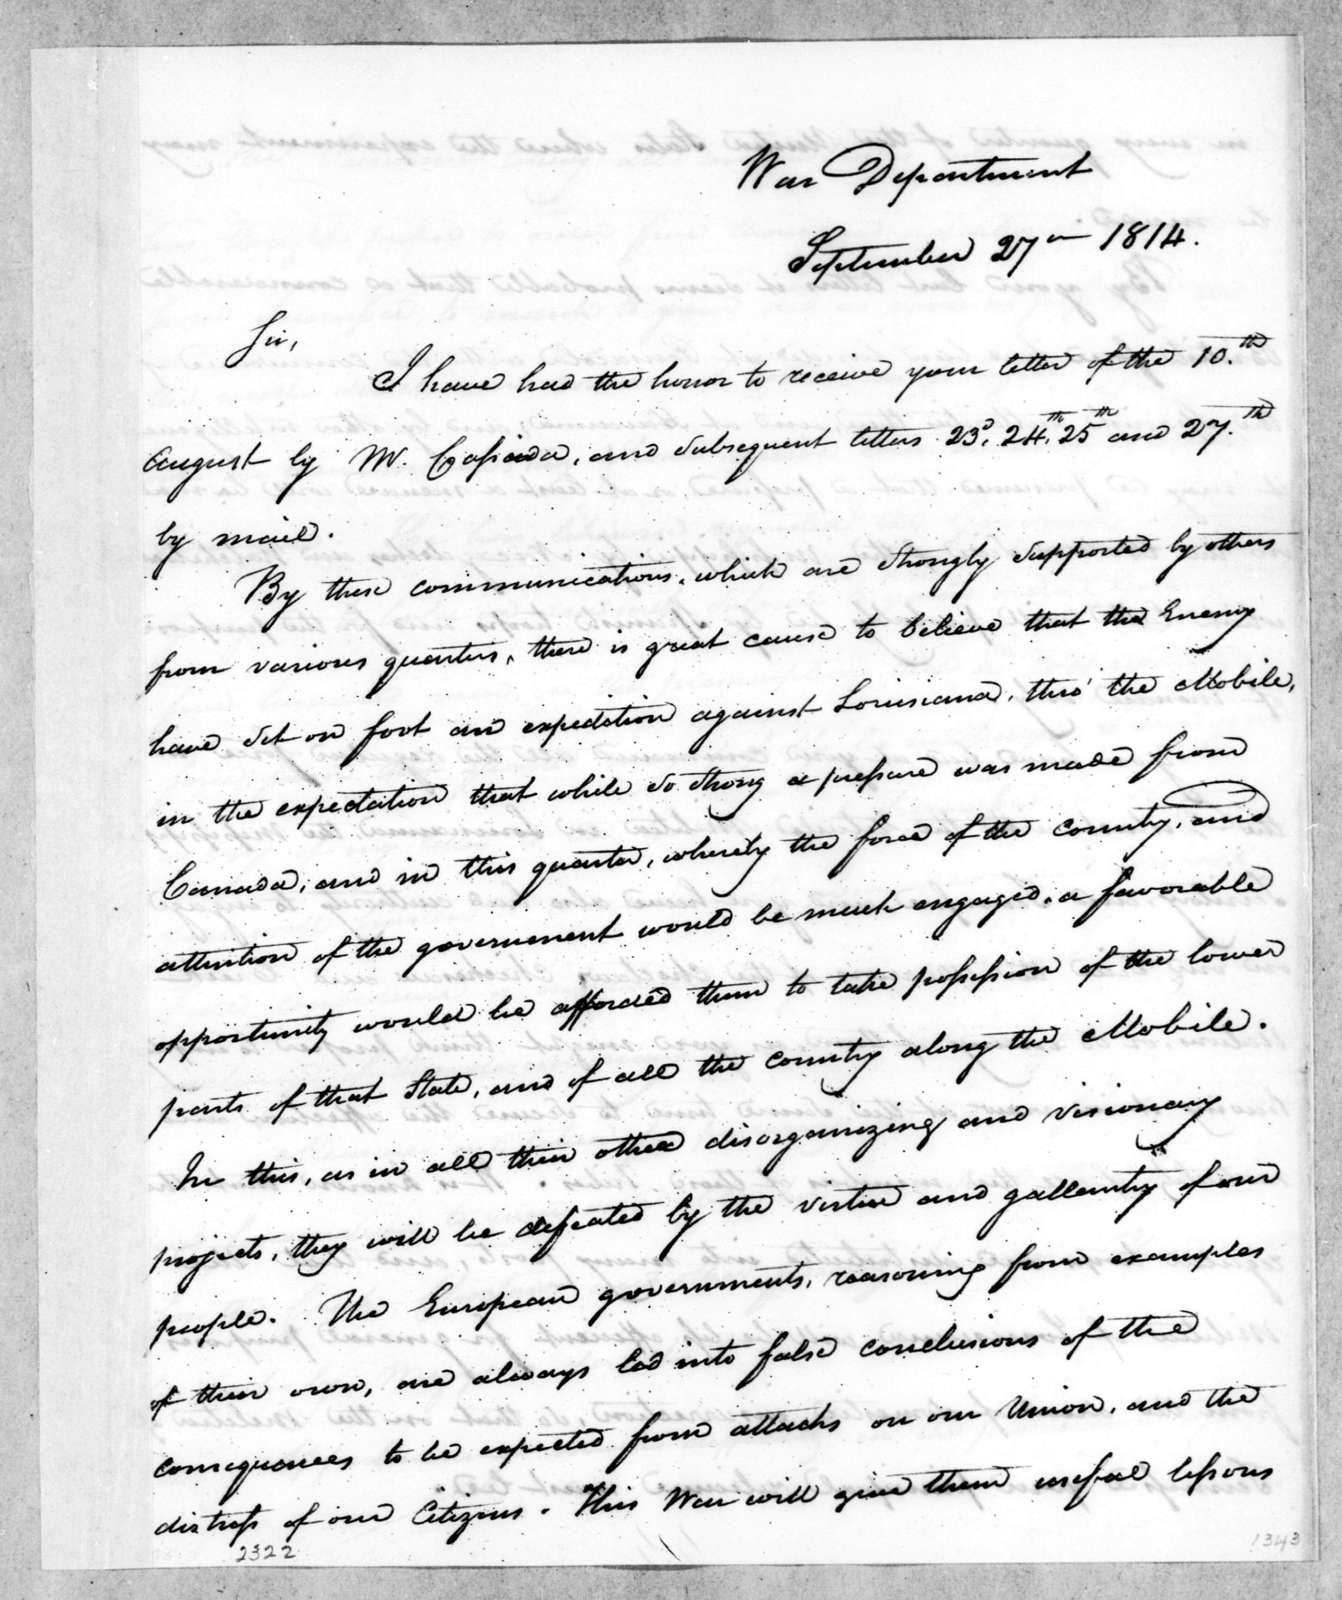 James Monroe to Andrew Jackson, September 27, 1814